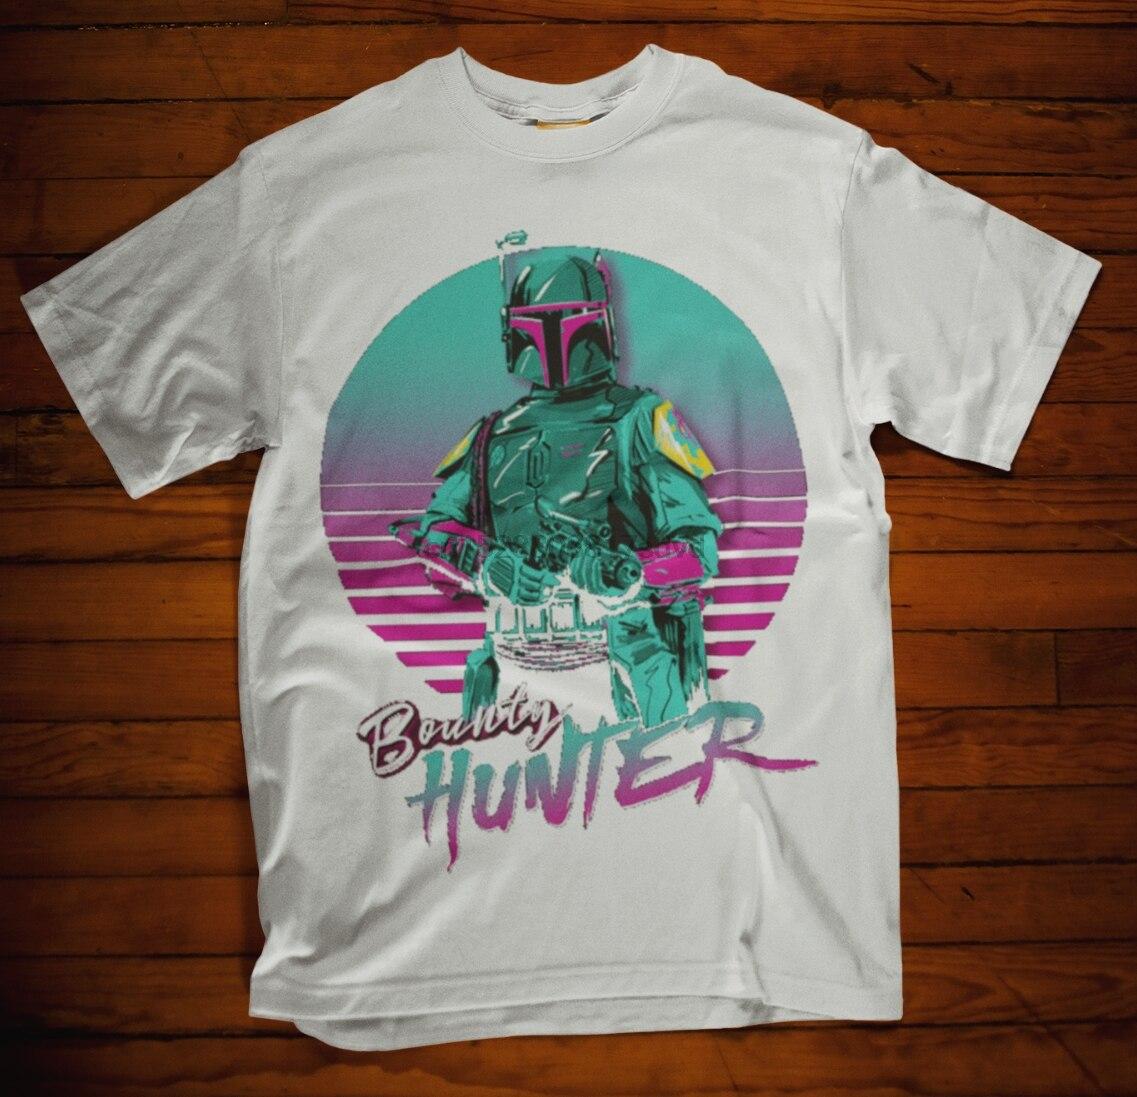 Bobba Fett t-shirtharajuku Streetwear camisa Menbounty Hunter película Retro sinvergüenzas scrugler (1)